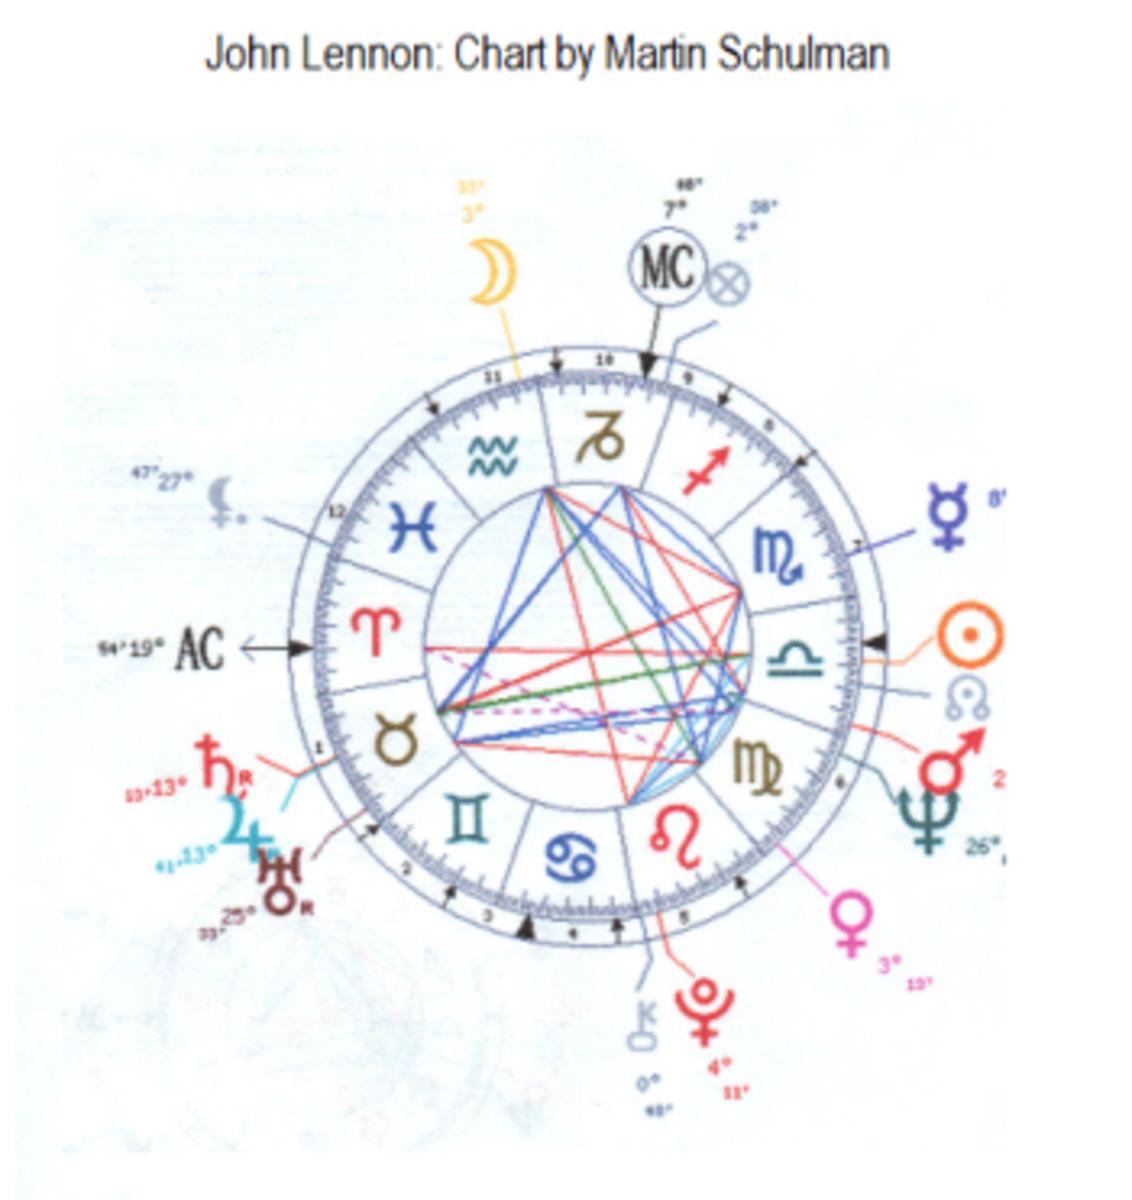 John Lennon Paul McCartney Astrological Comparison